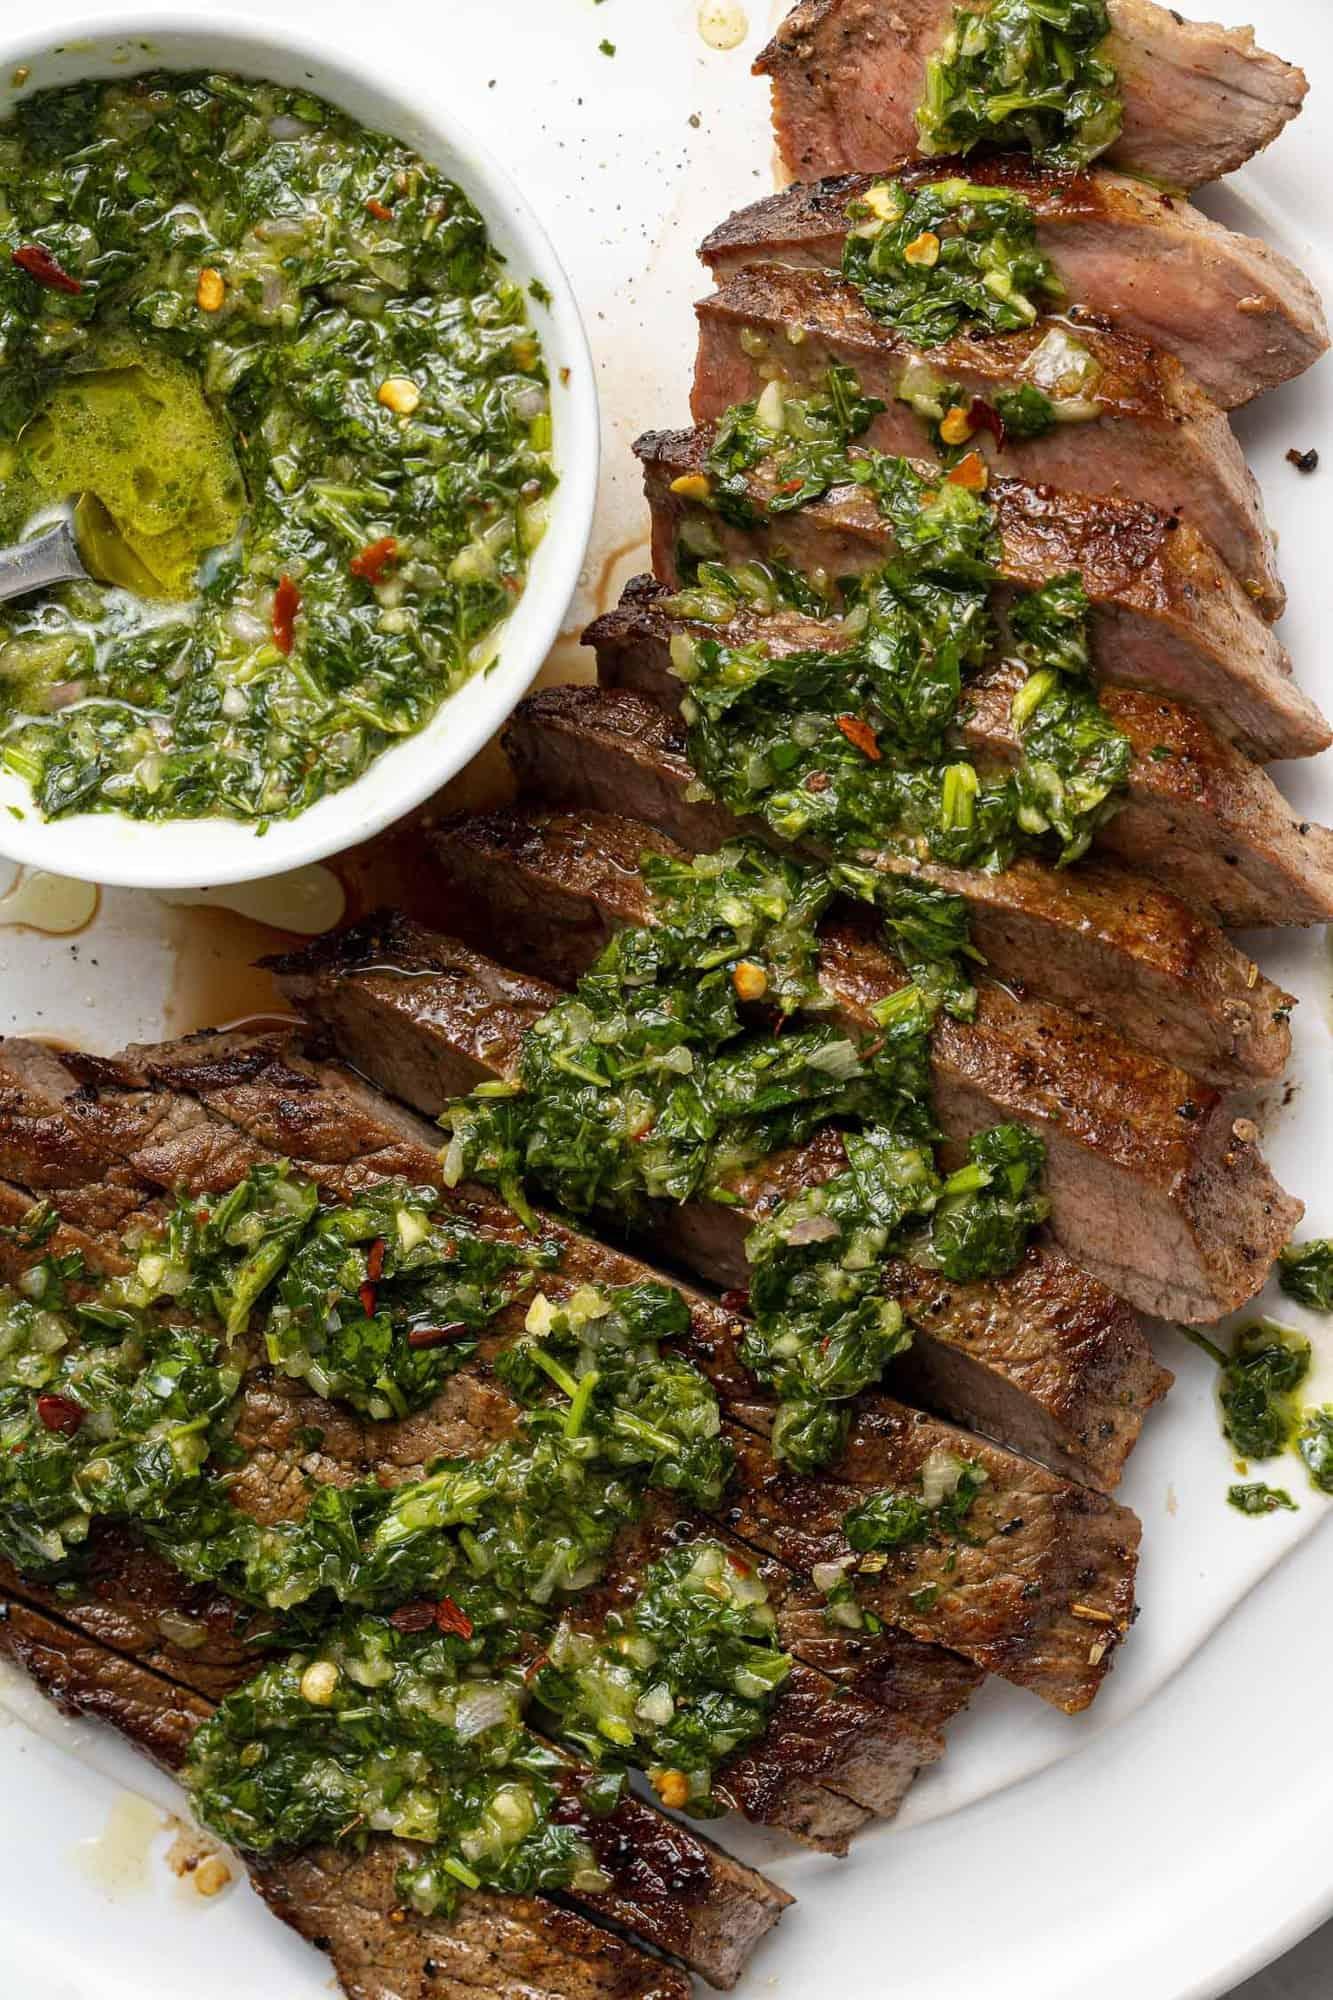 Close up of chimichurri on sliced steak.